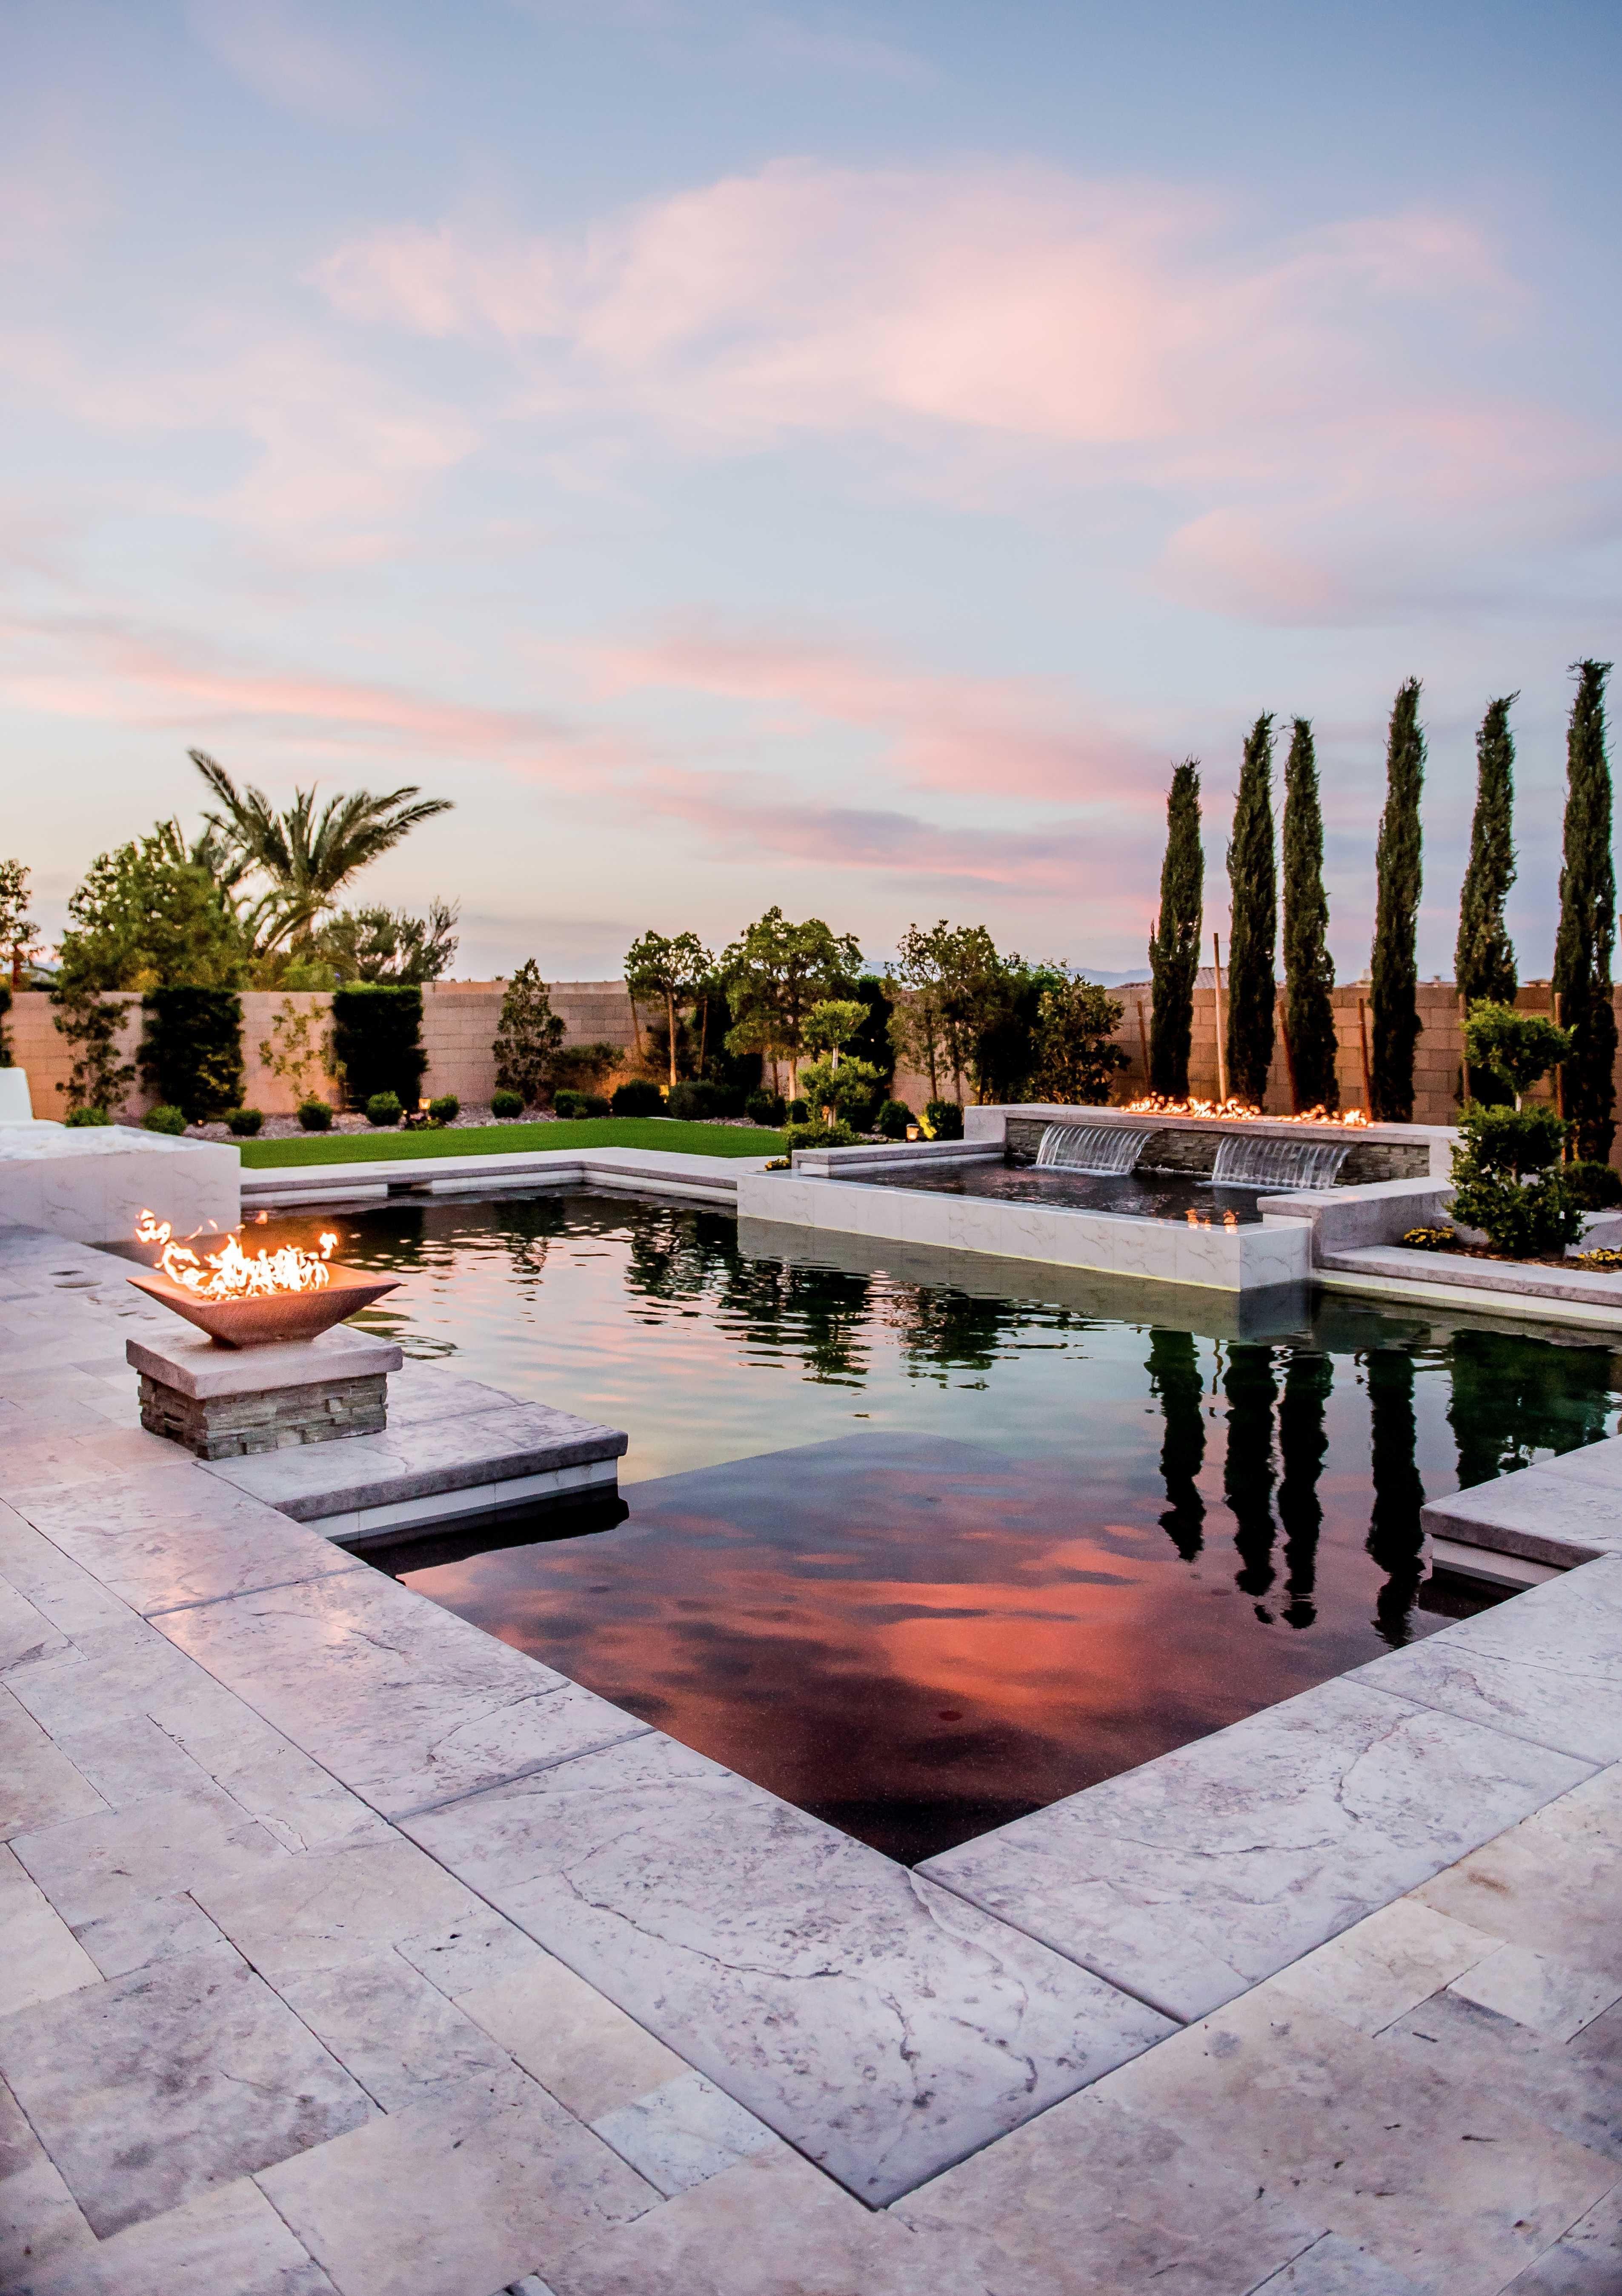 18 Gorgeous Backyard Designs Ideas With Swimming Pool  Backyard